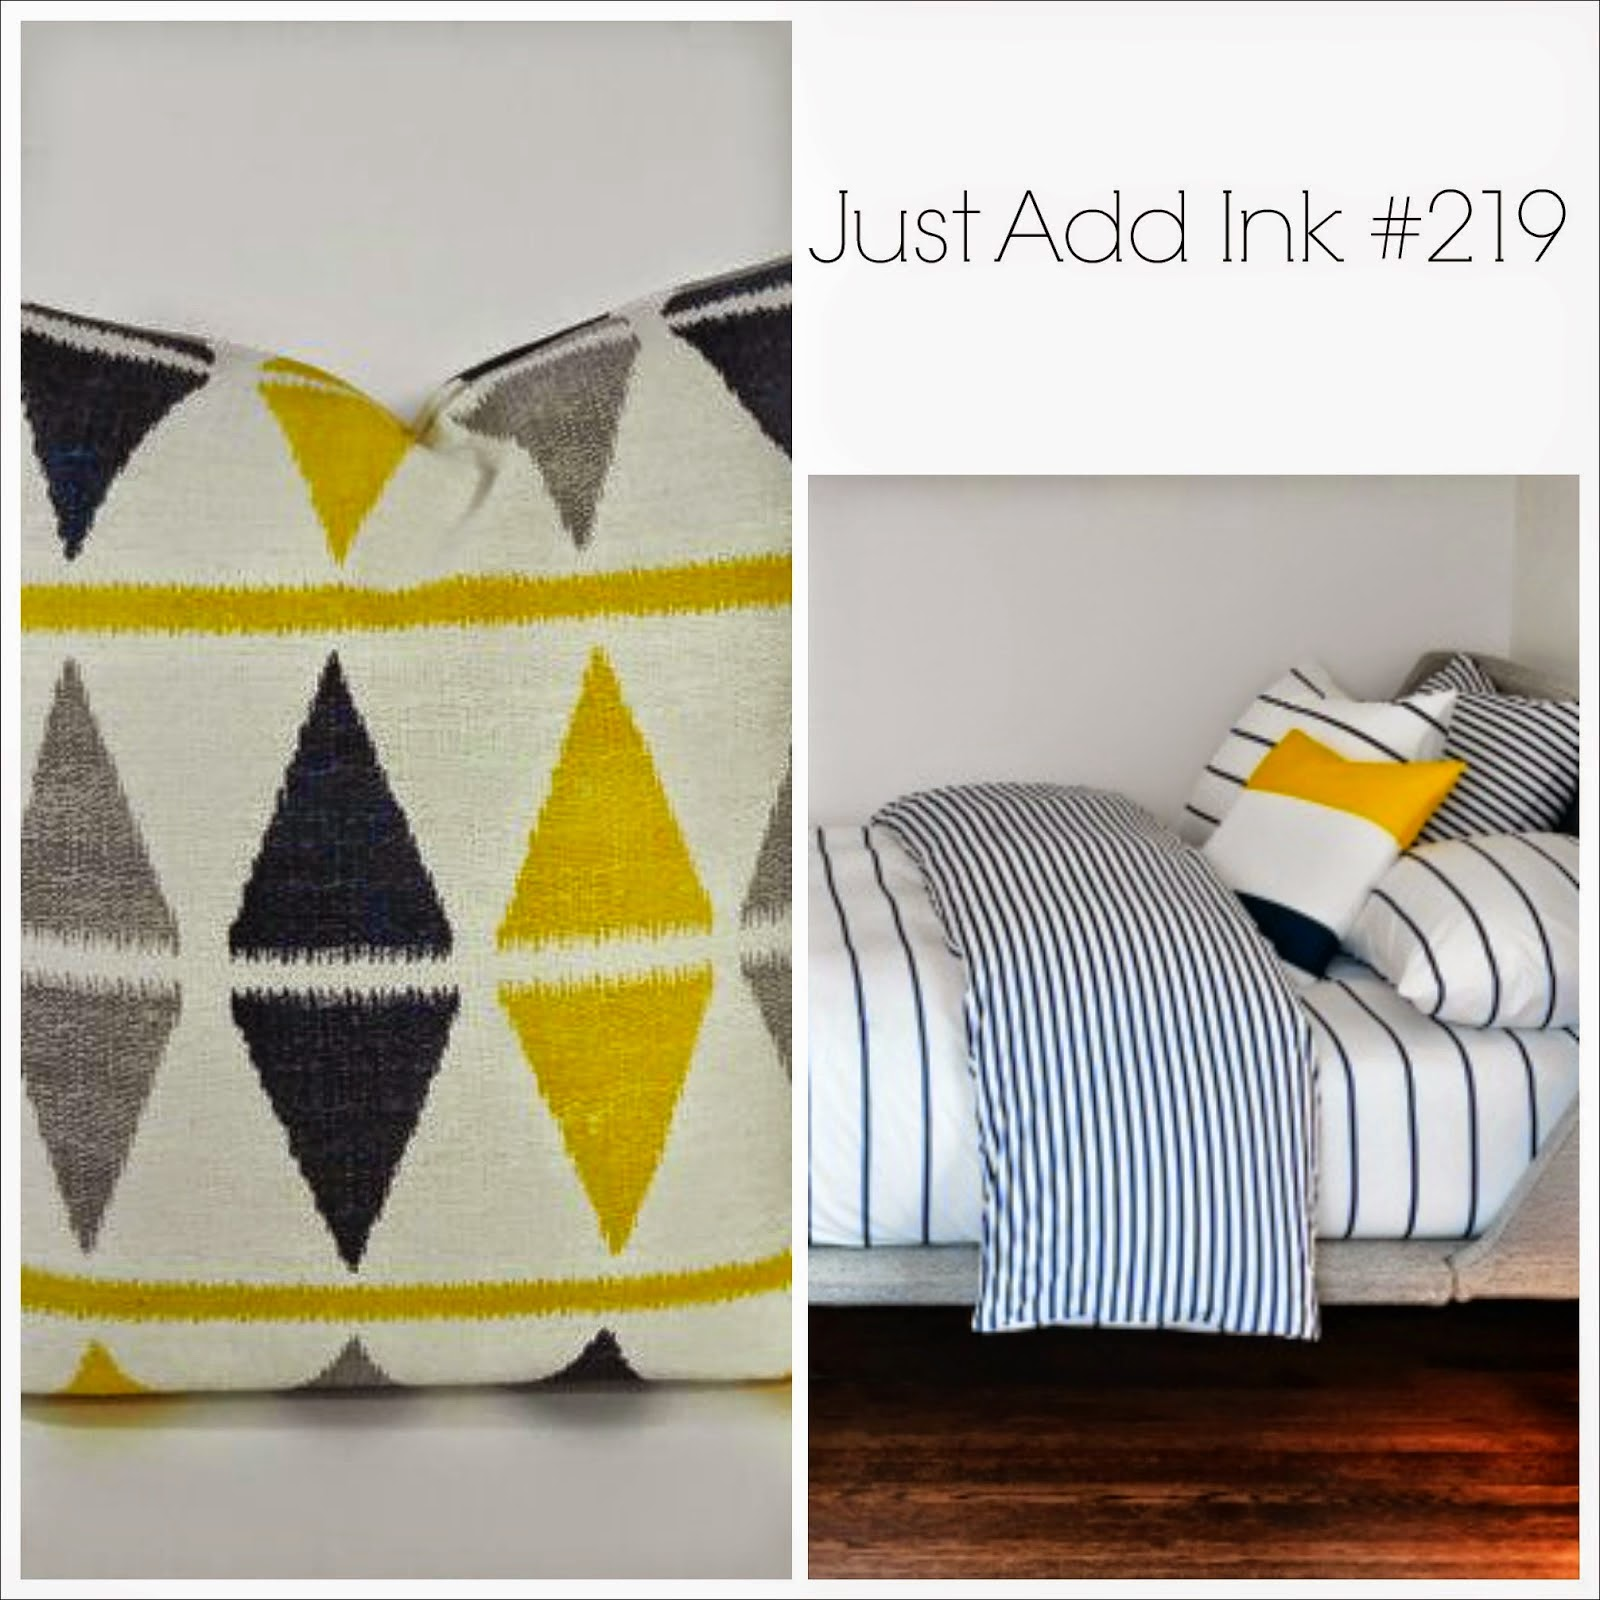 http://www.just-add-ink.blogspot.com.au/2014/06/just-add-ink-219-just-add-inspiration.html